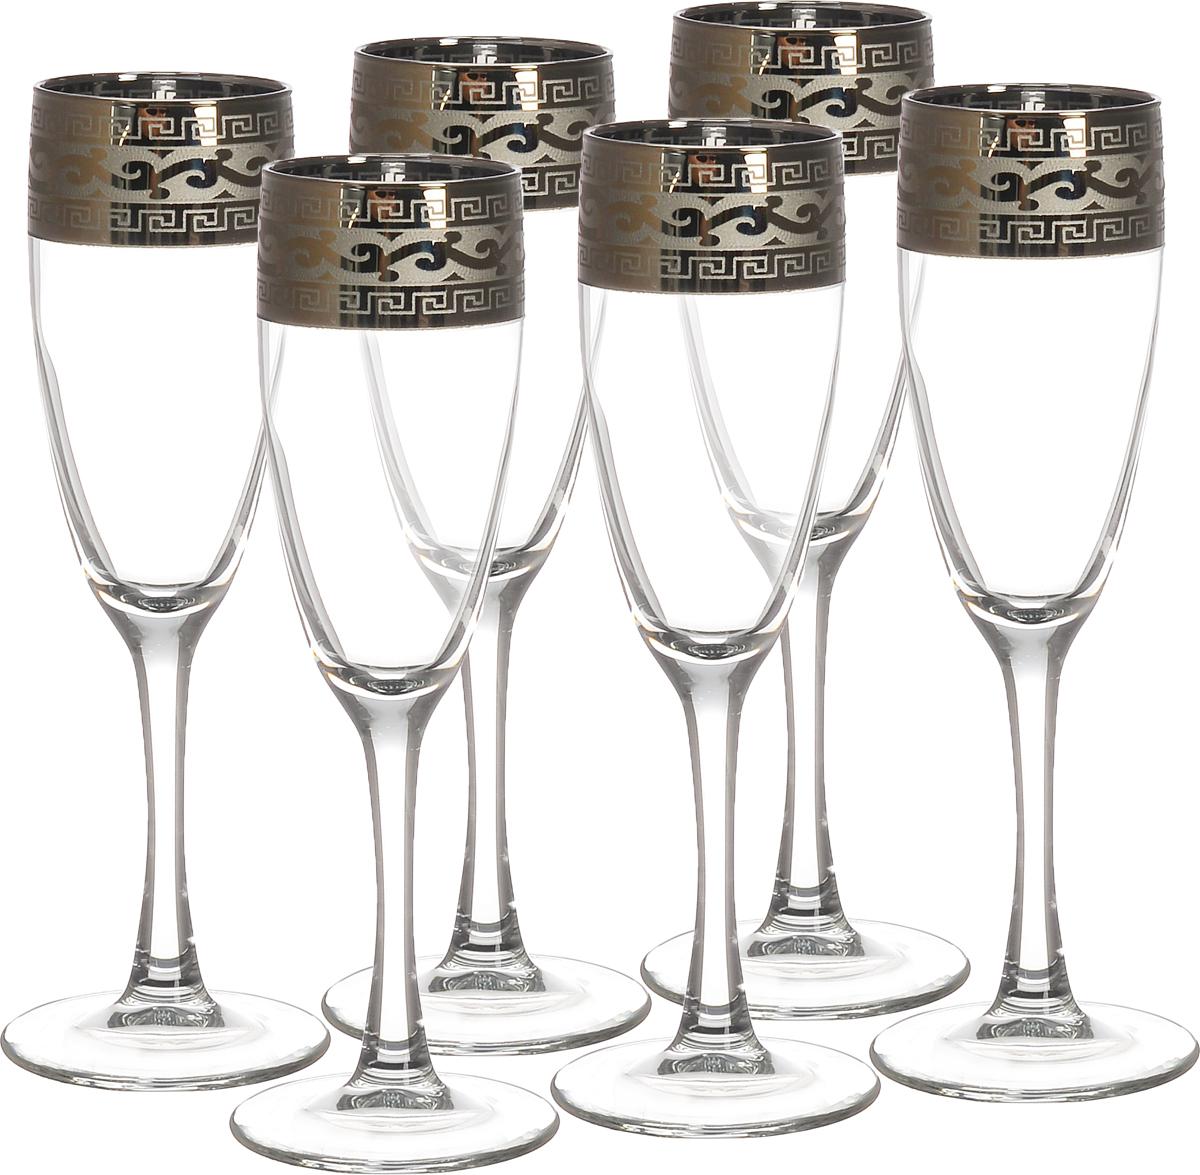 Набор бокалов Гусь-Хрустальный Версаче, 170 мл, 6 шт набор бокалов гусь хрустальный флорис 190 мл 6 шт